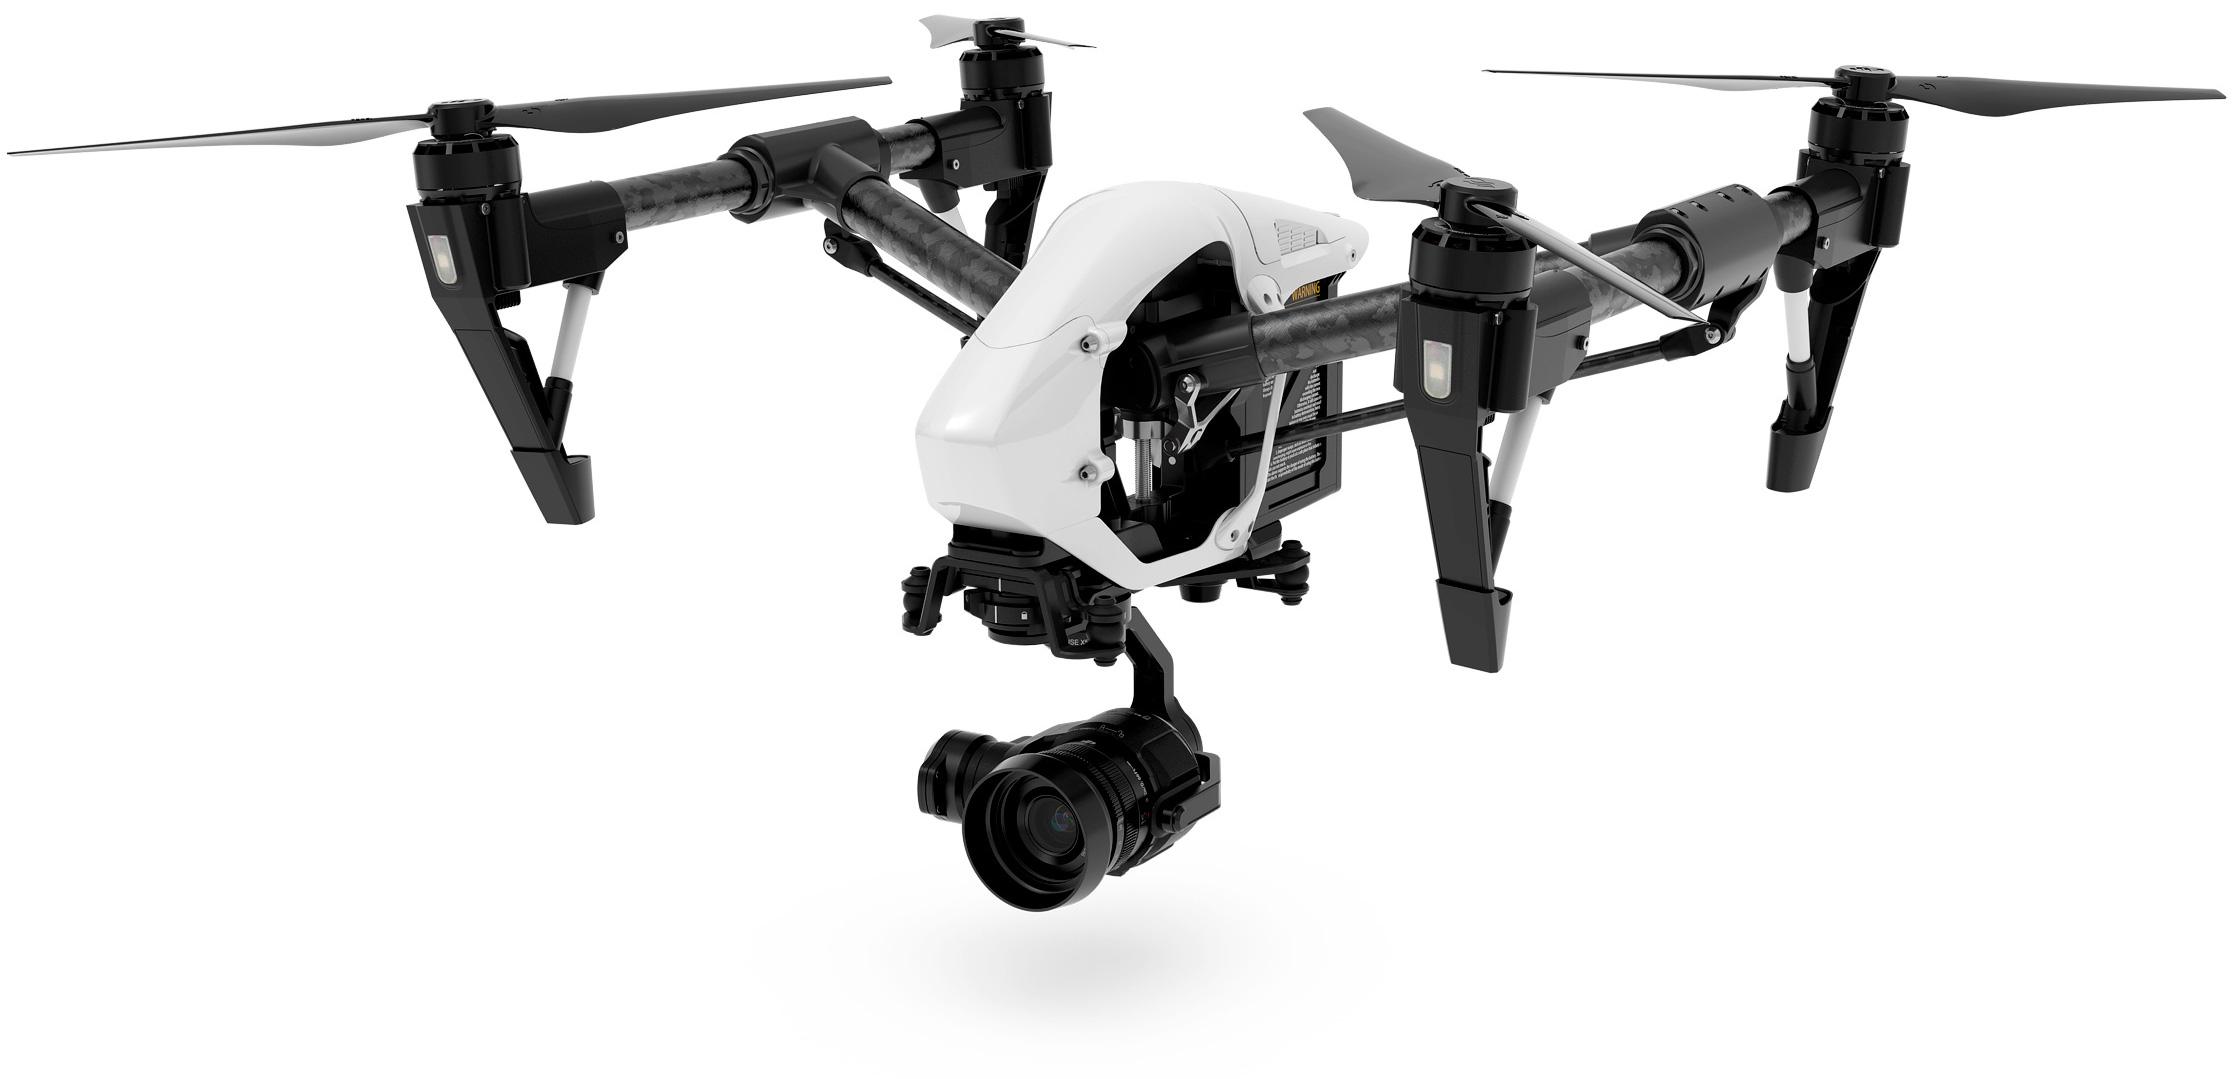 DJI Inspire 1 Pro mit Zenmuse X5 Kamera + Gimbal (Quelle: dji.com)